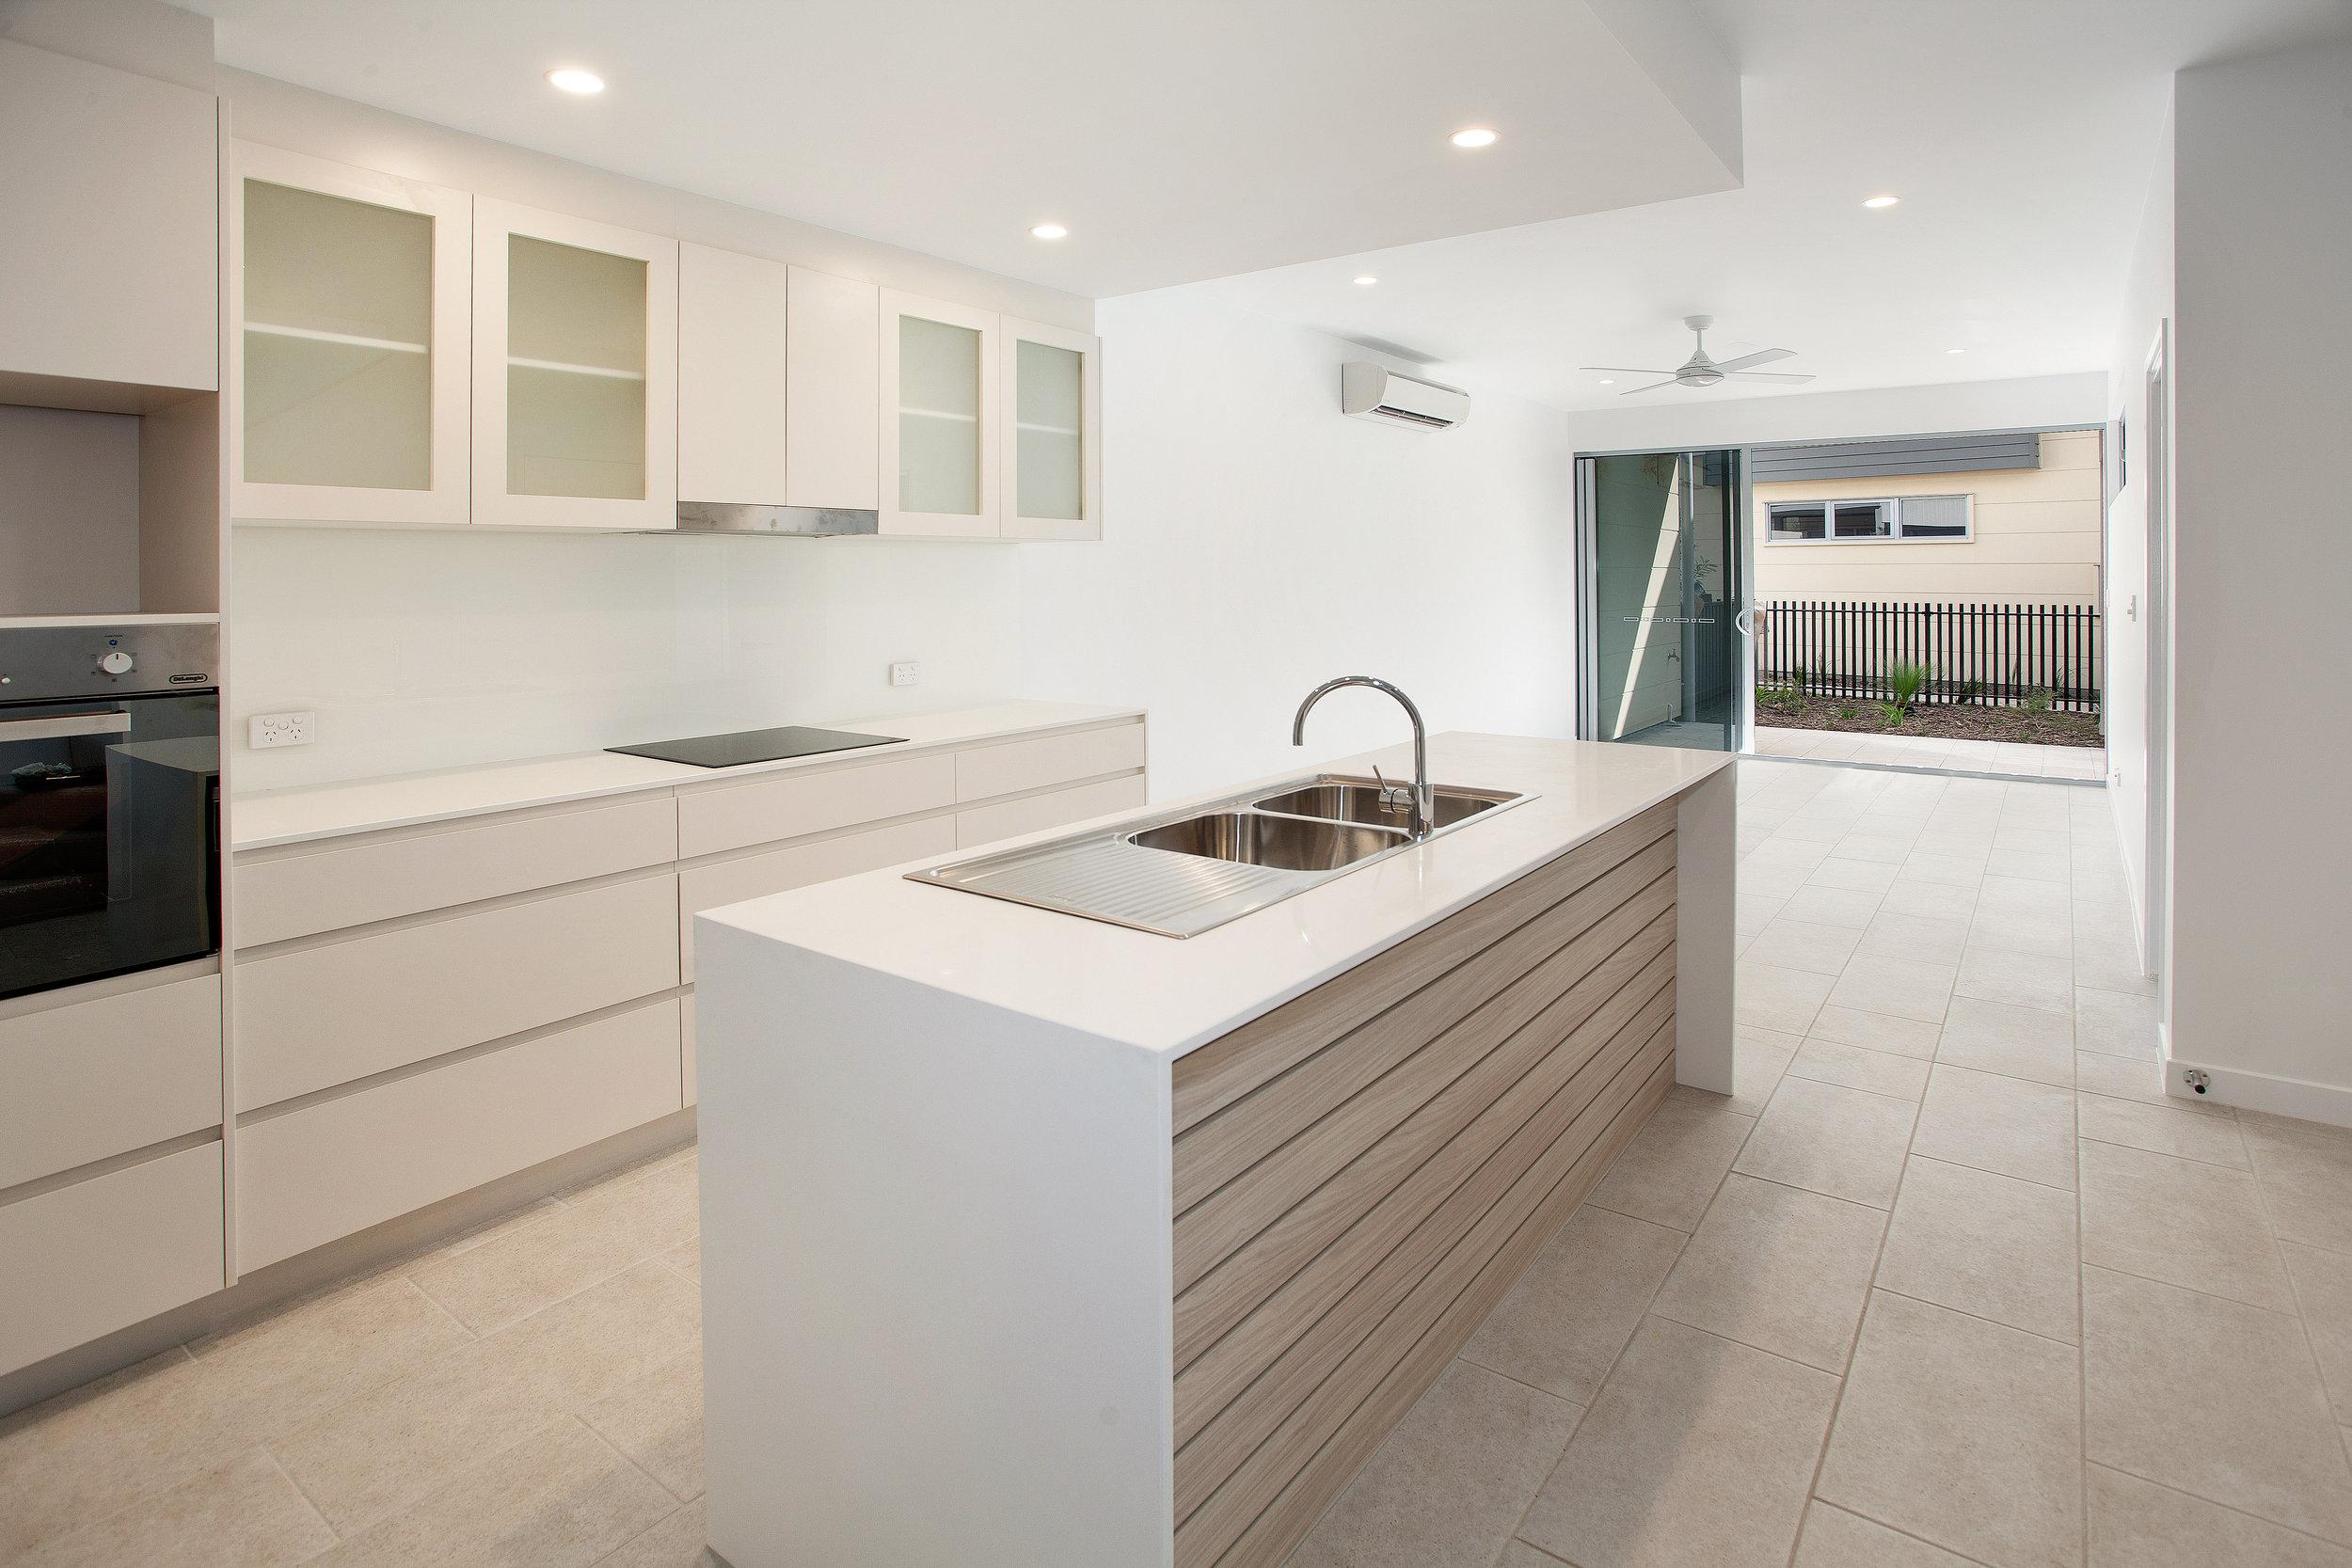 Oxford Kitchen - floor tiles clean, remove defect tape.jpg